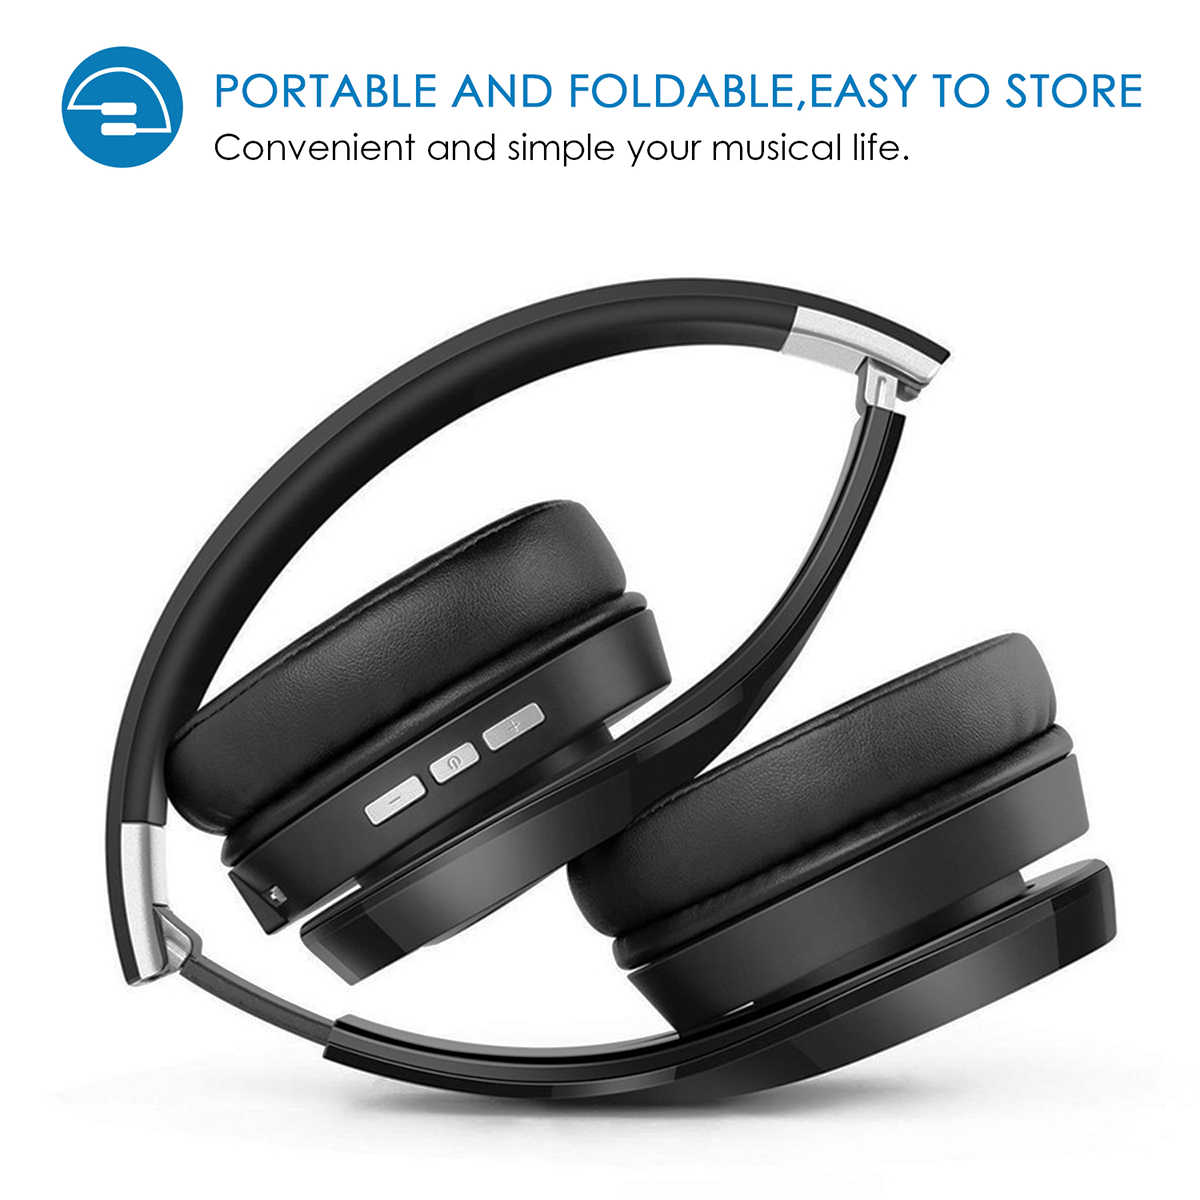 41b878a7b97 ... ELEGIANT S1 HiFi estéreo bluetooth inalámbrico 4,1 Auriculares  auriculares para juegos plegable del auricular ...